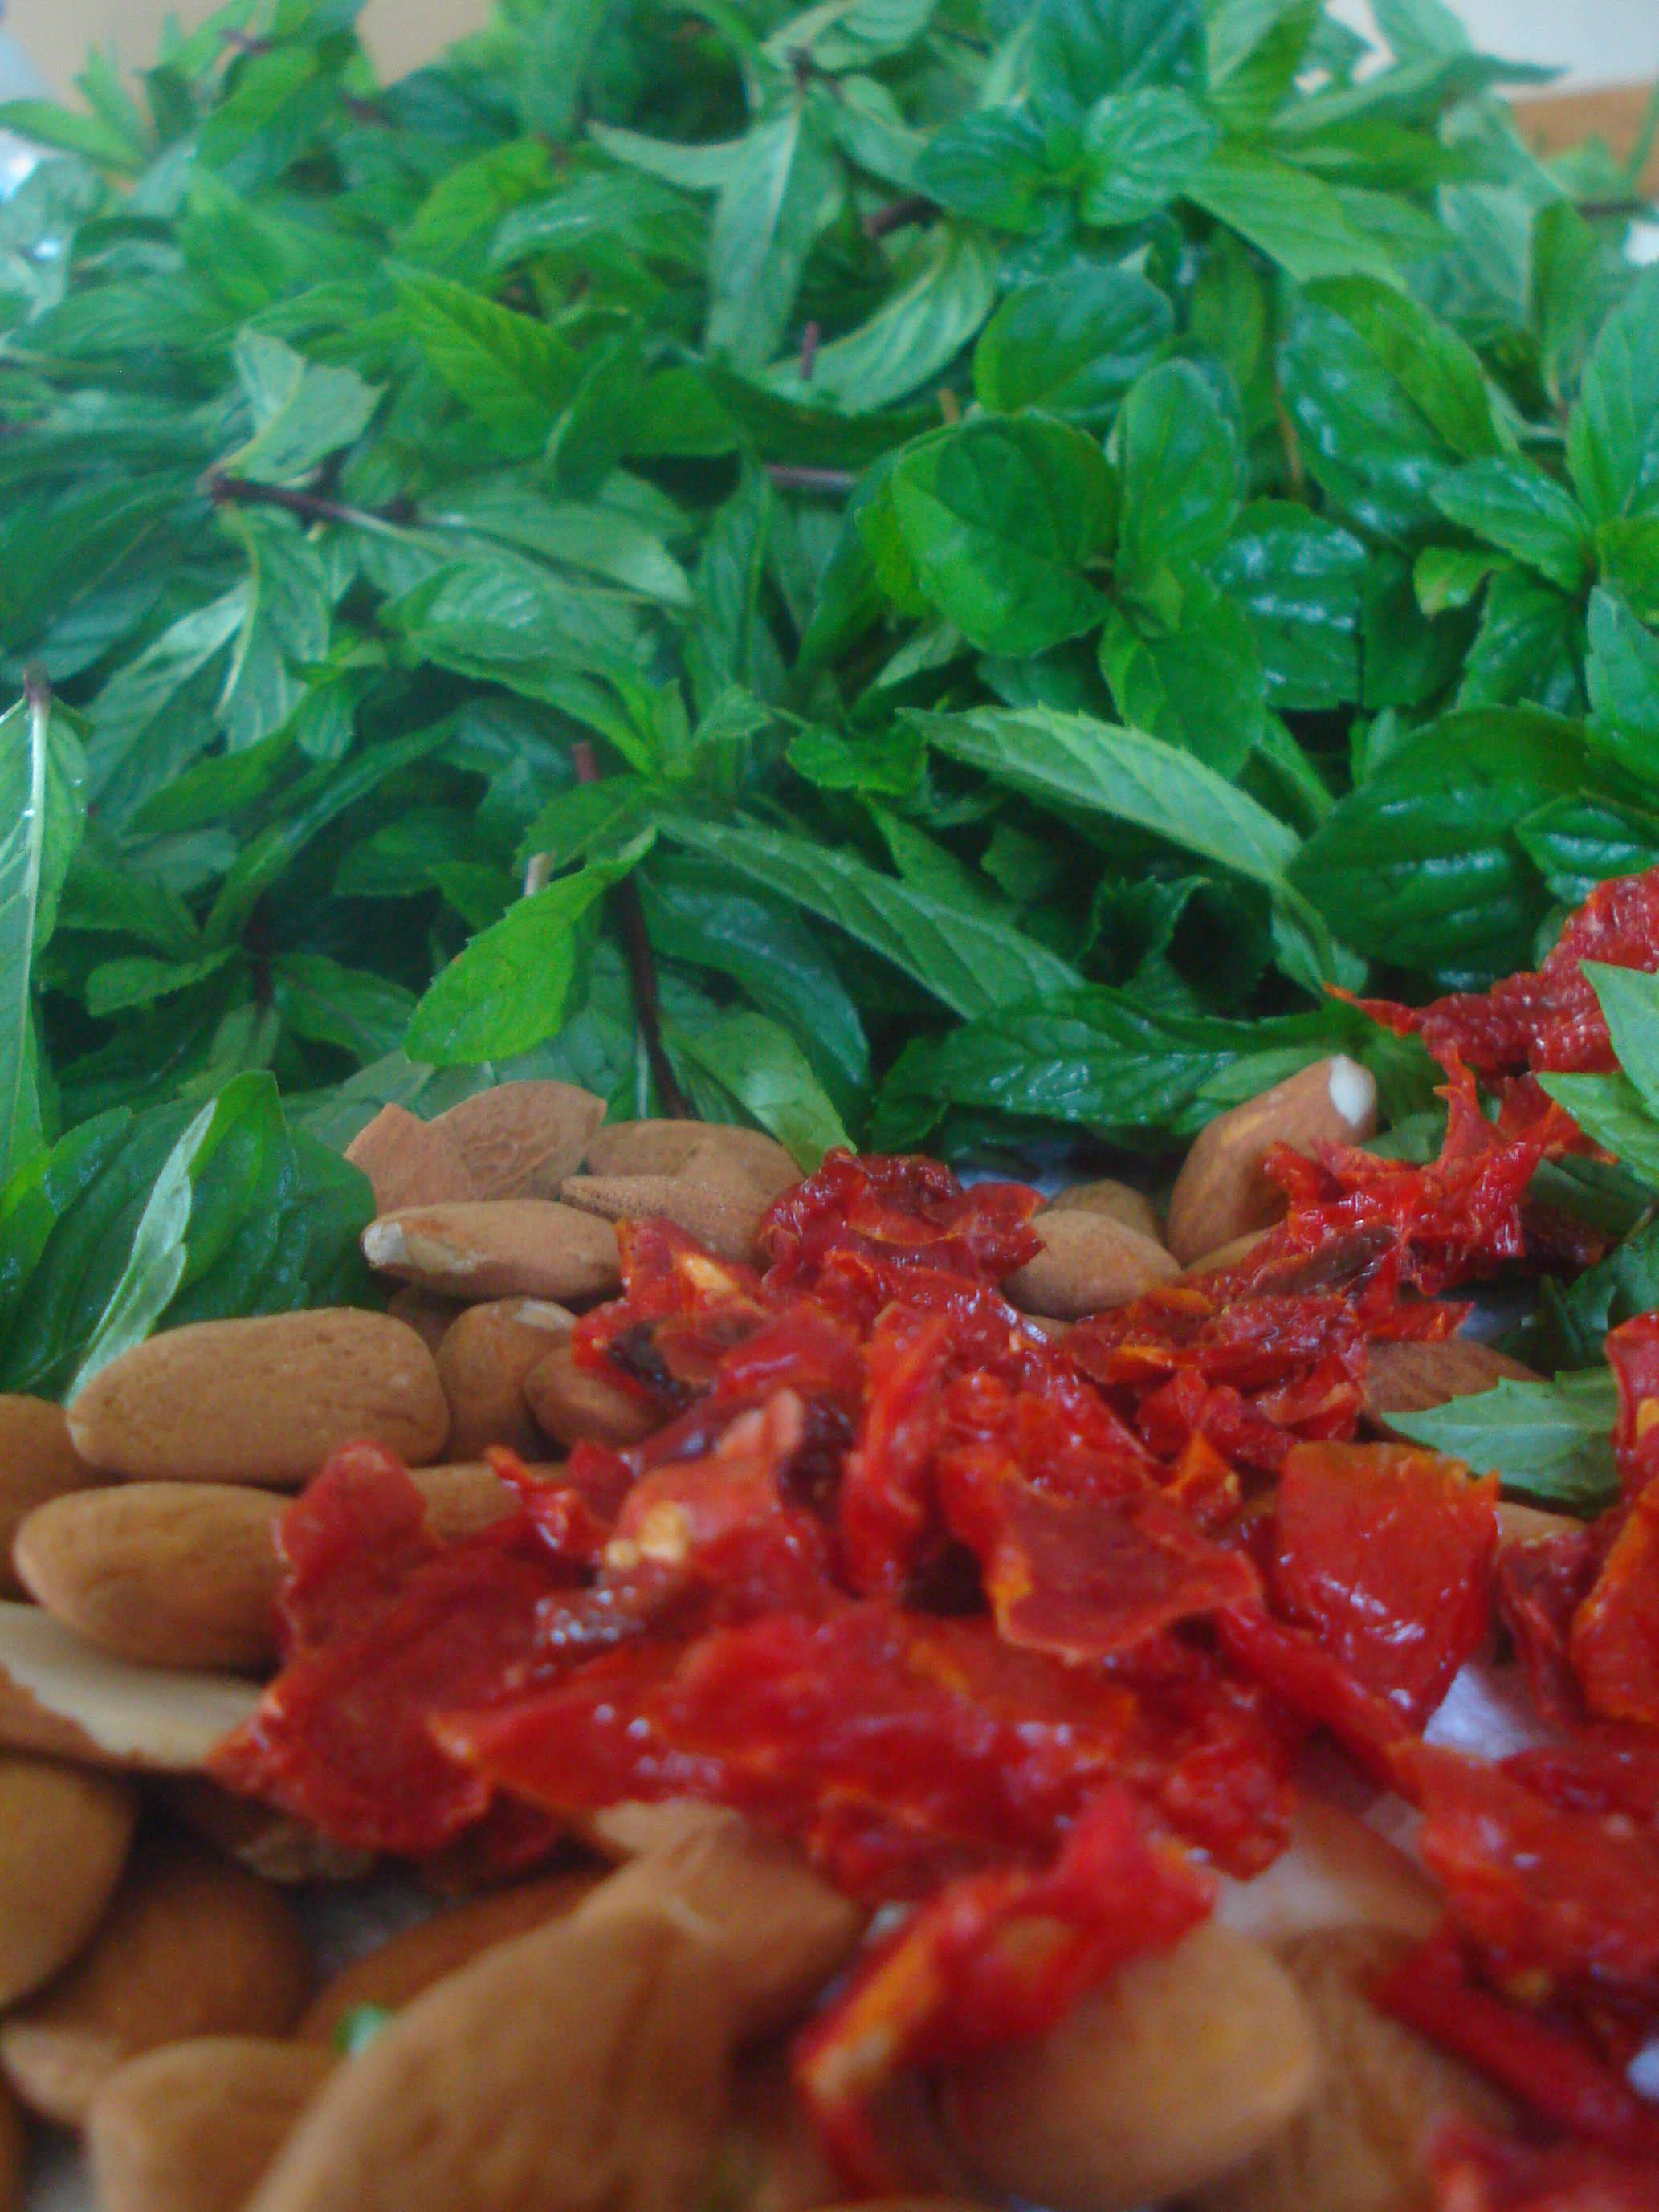 menthe, tomates, amandes